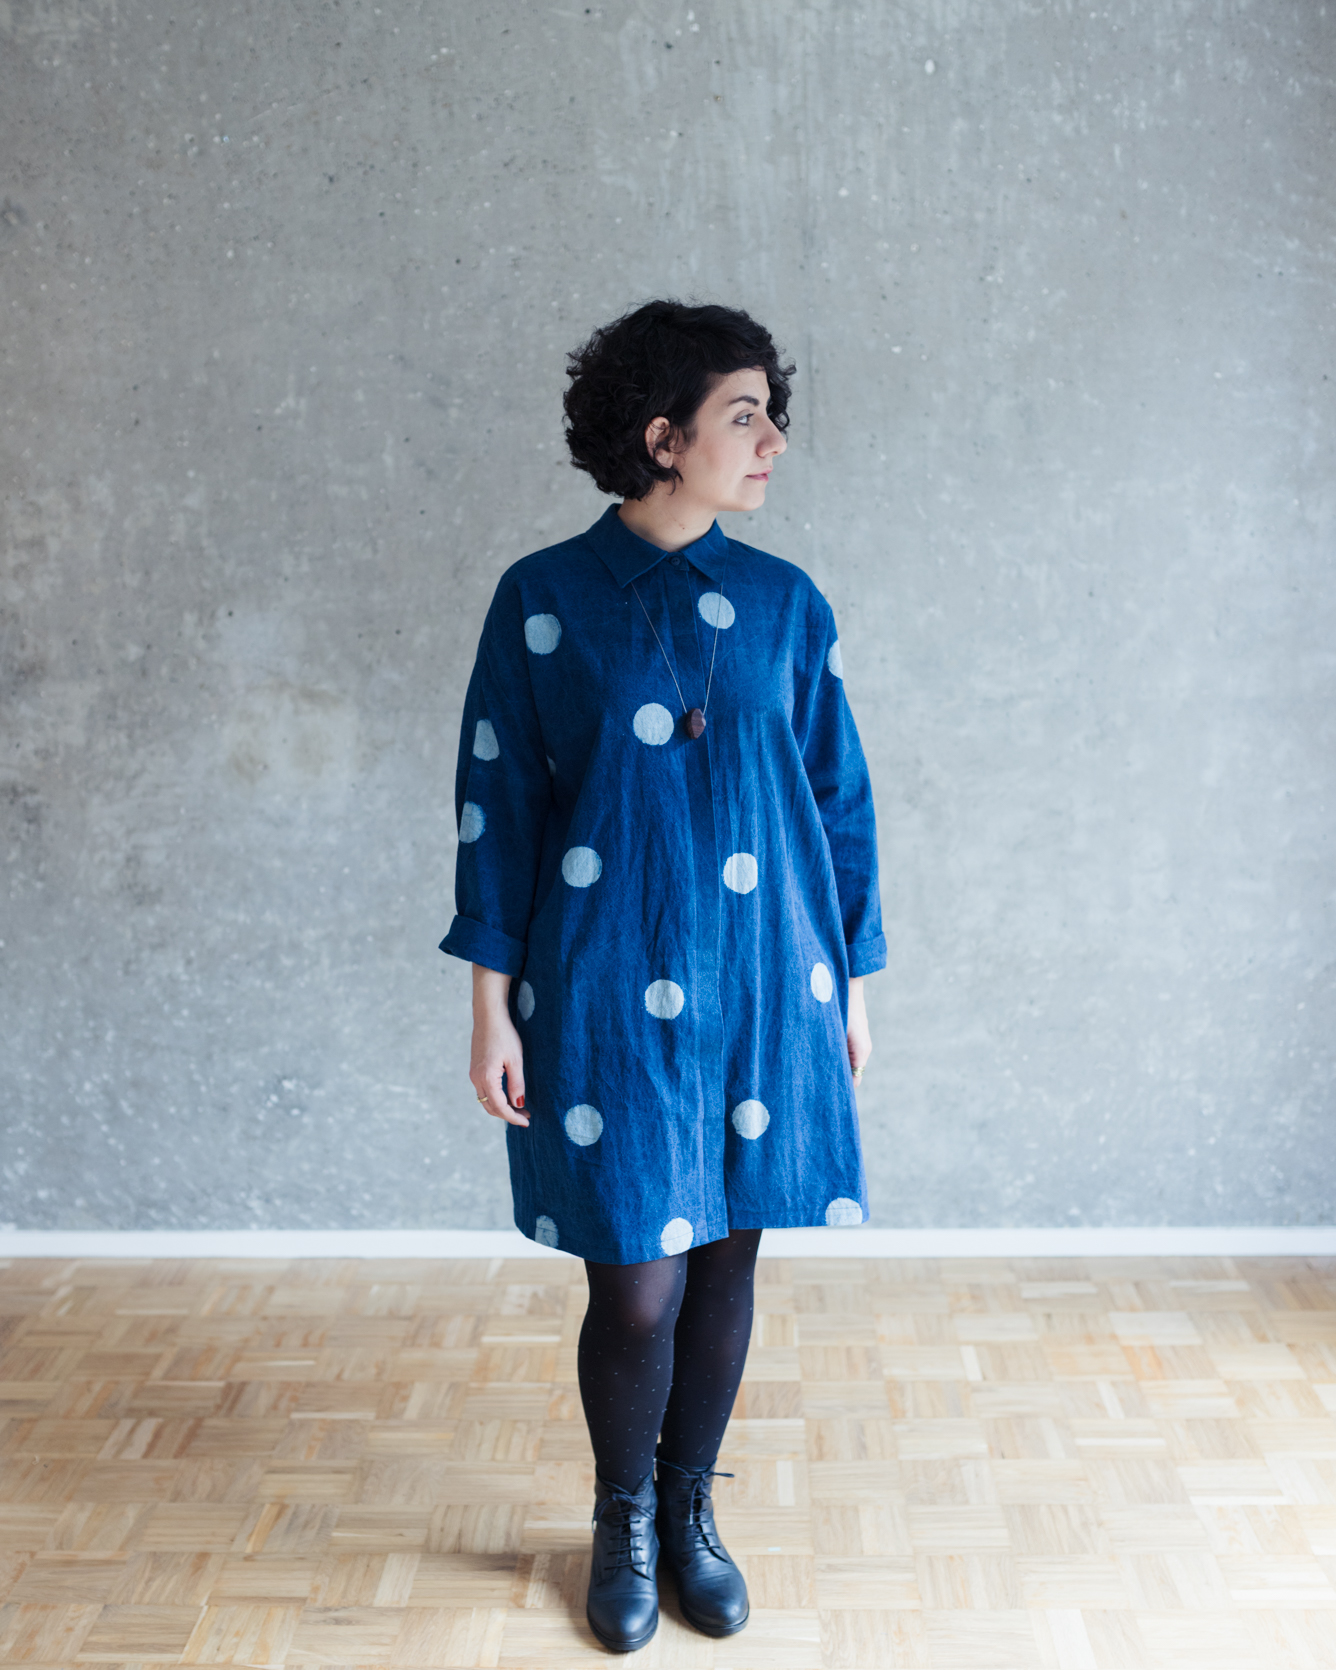 Blusenkleid nähen: Schnittmuster Oversize Blusenkleid Cocoon - Schnittduett